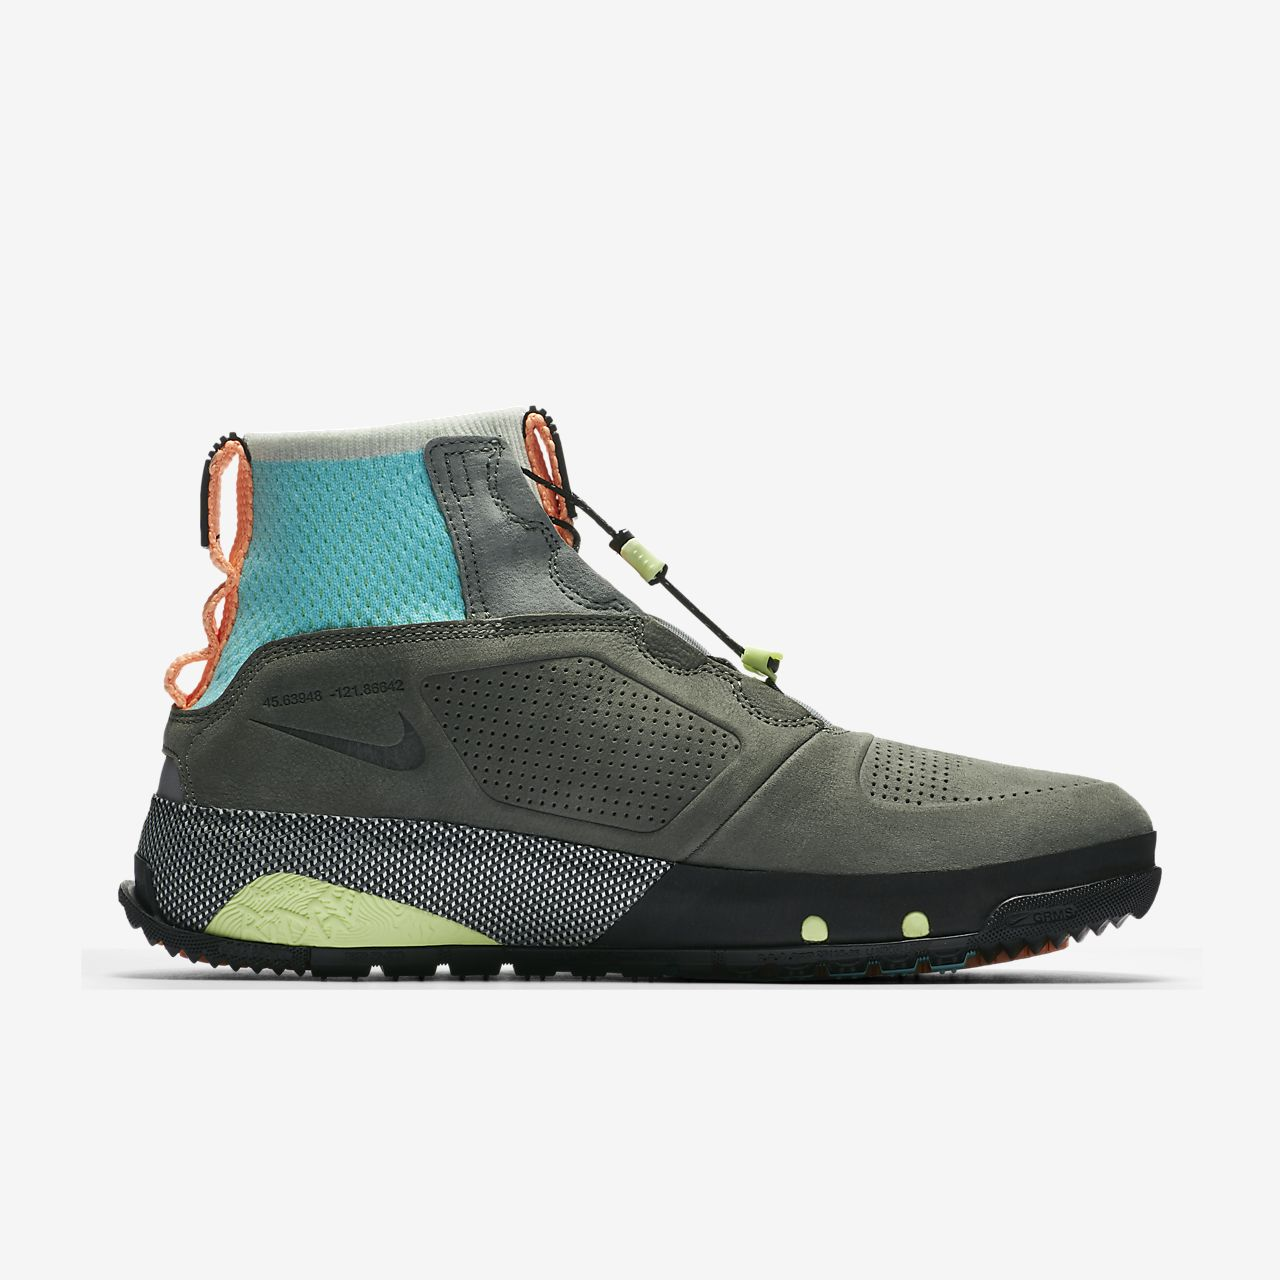 Para Ridgemx Acg Nike Calzado Ruckle Hombre Xdoqcbtsrh N0mnw8